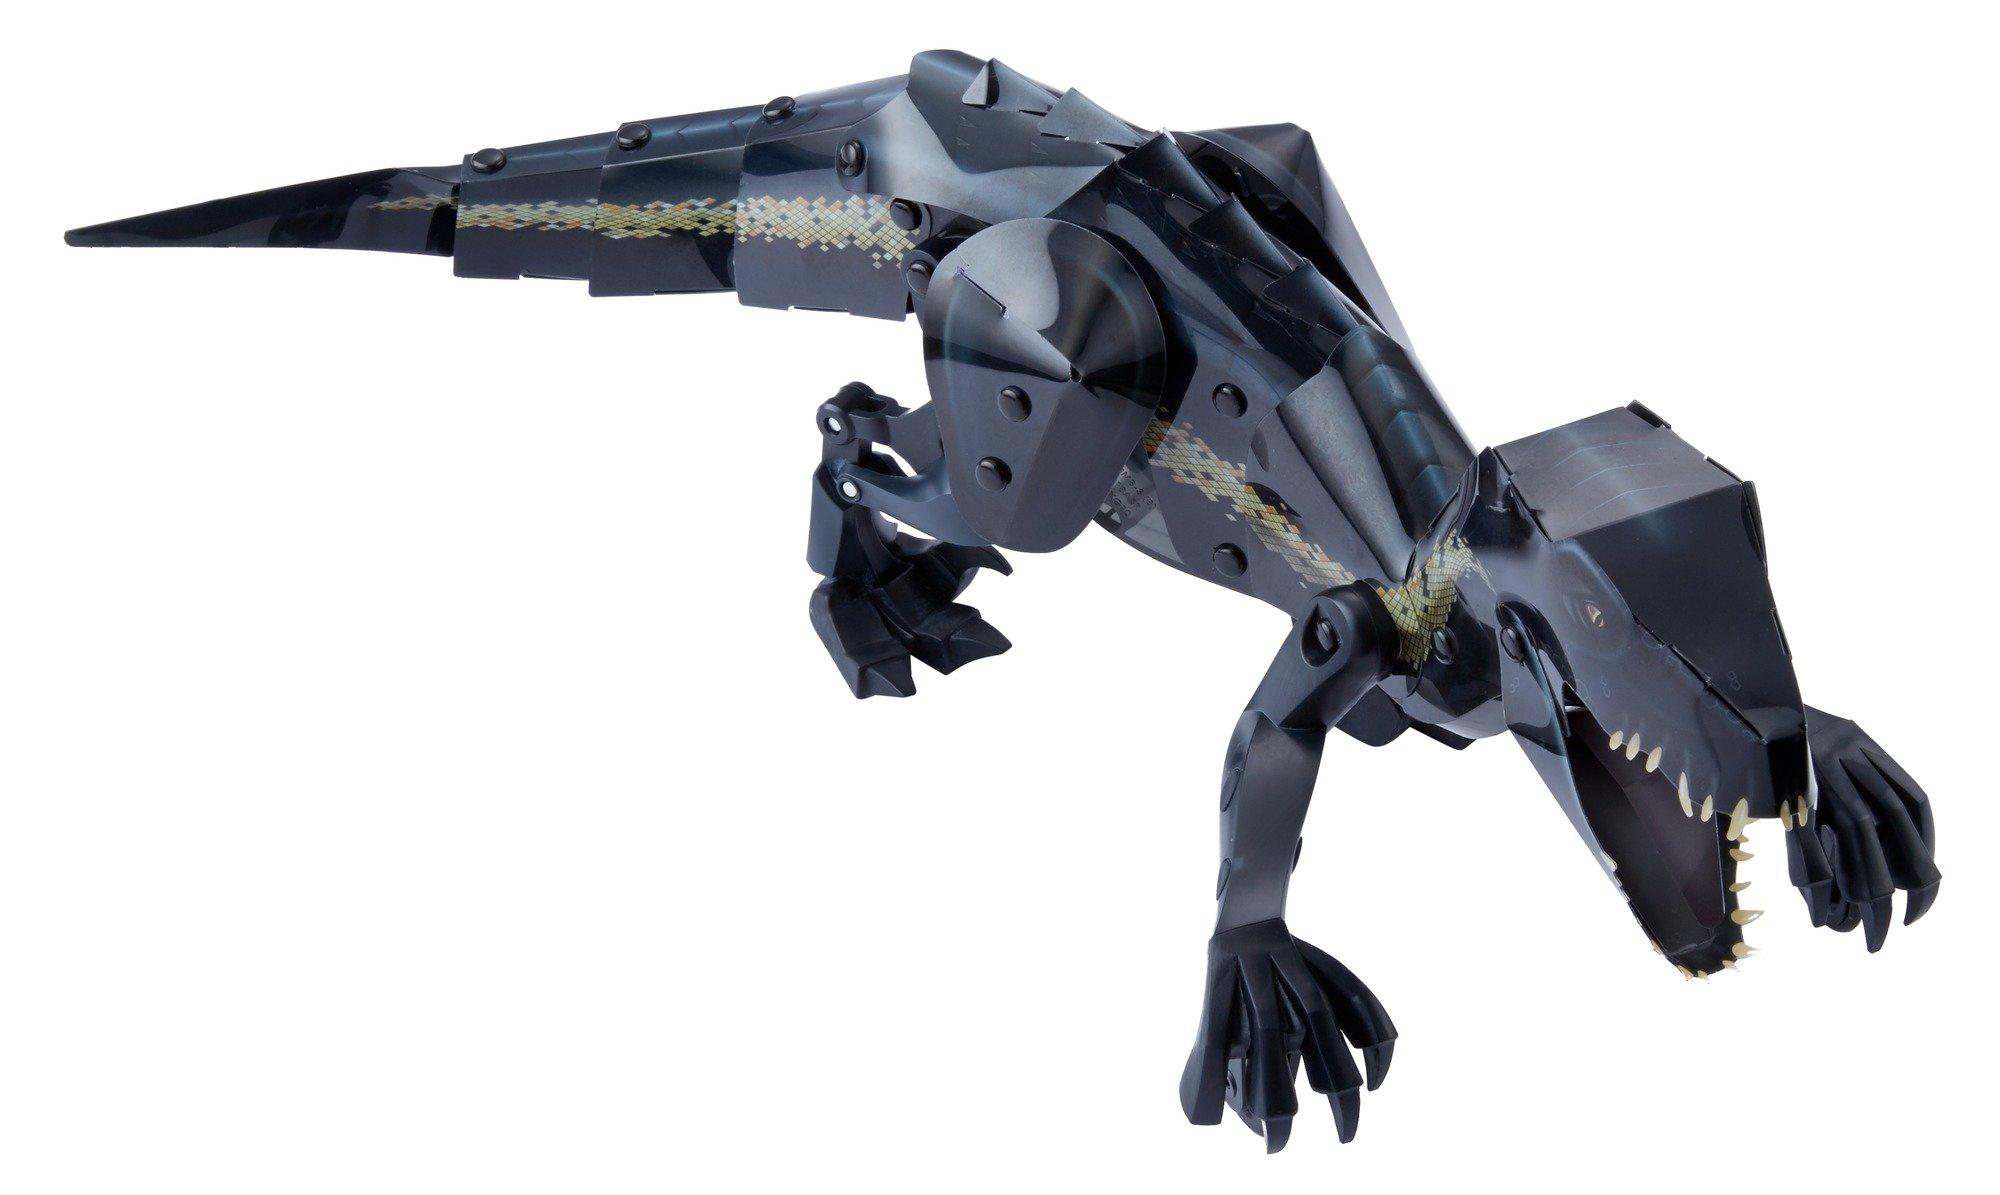 Kamigami Jurassic World Indoraptor Robot by Jurassic World Toys (Image #12)